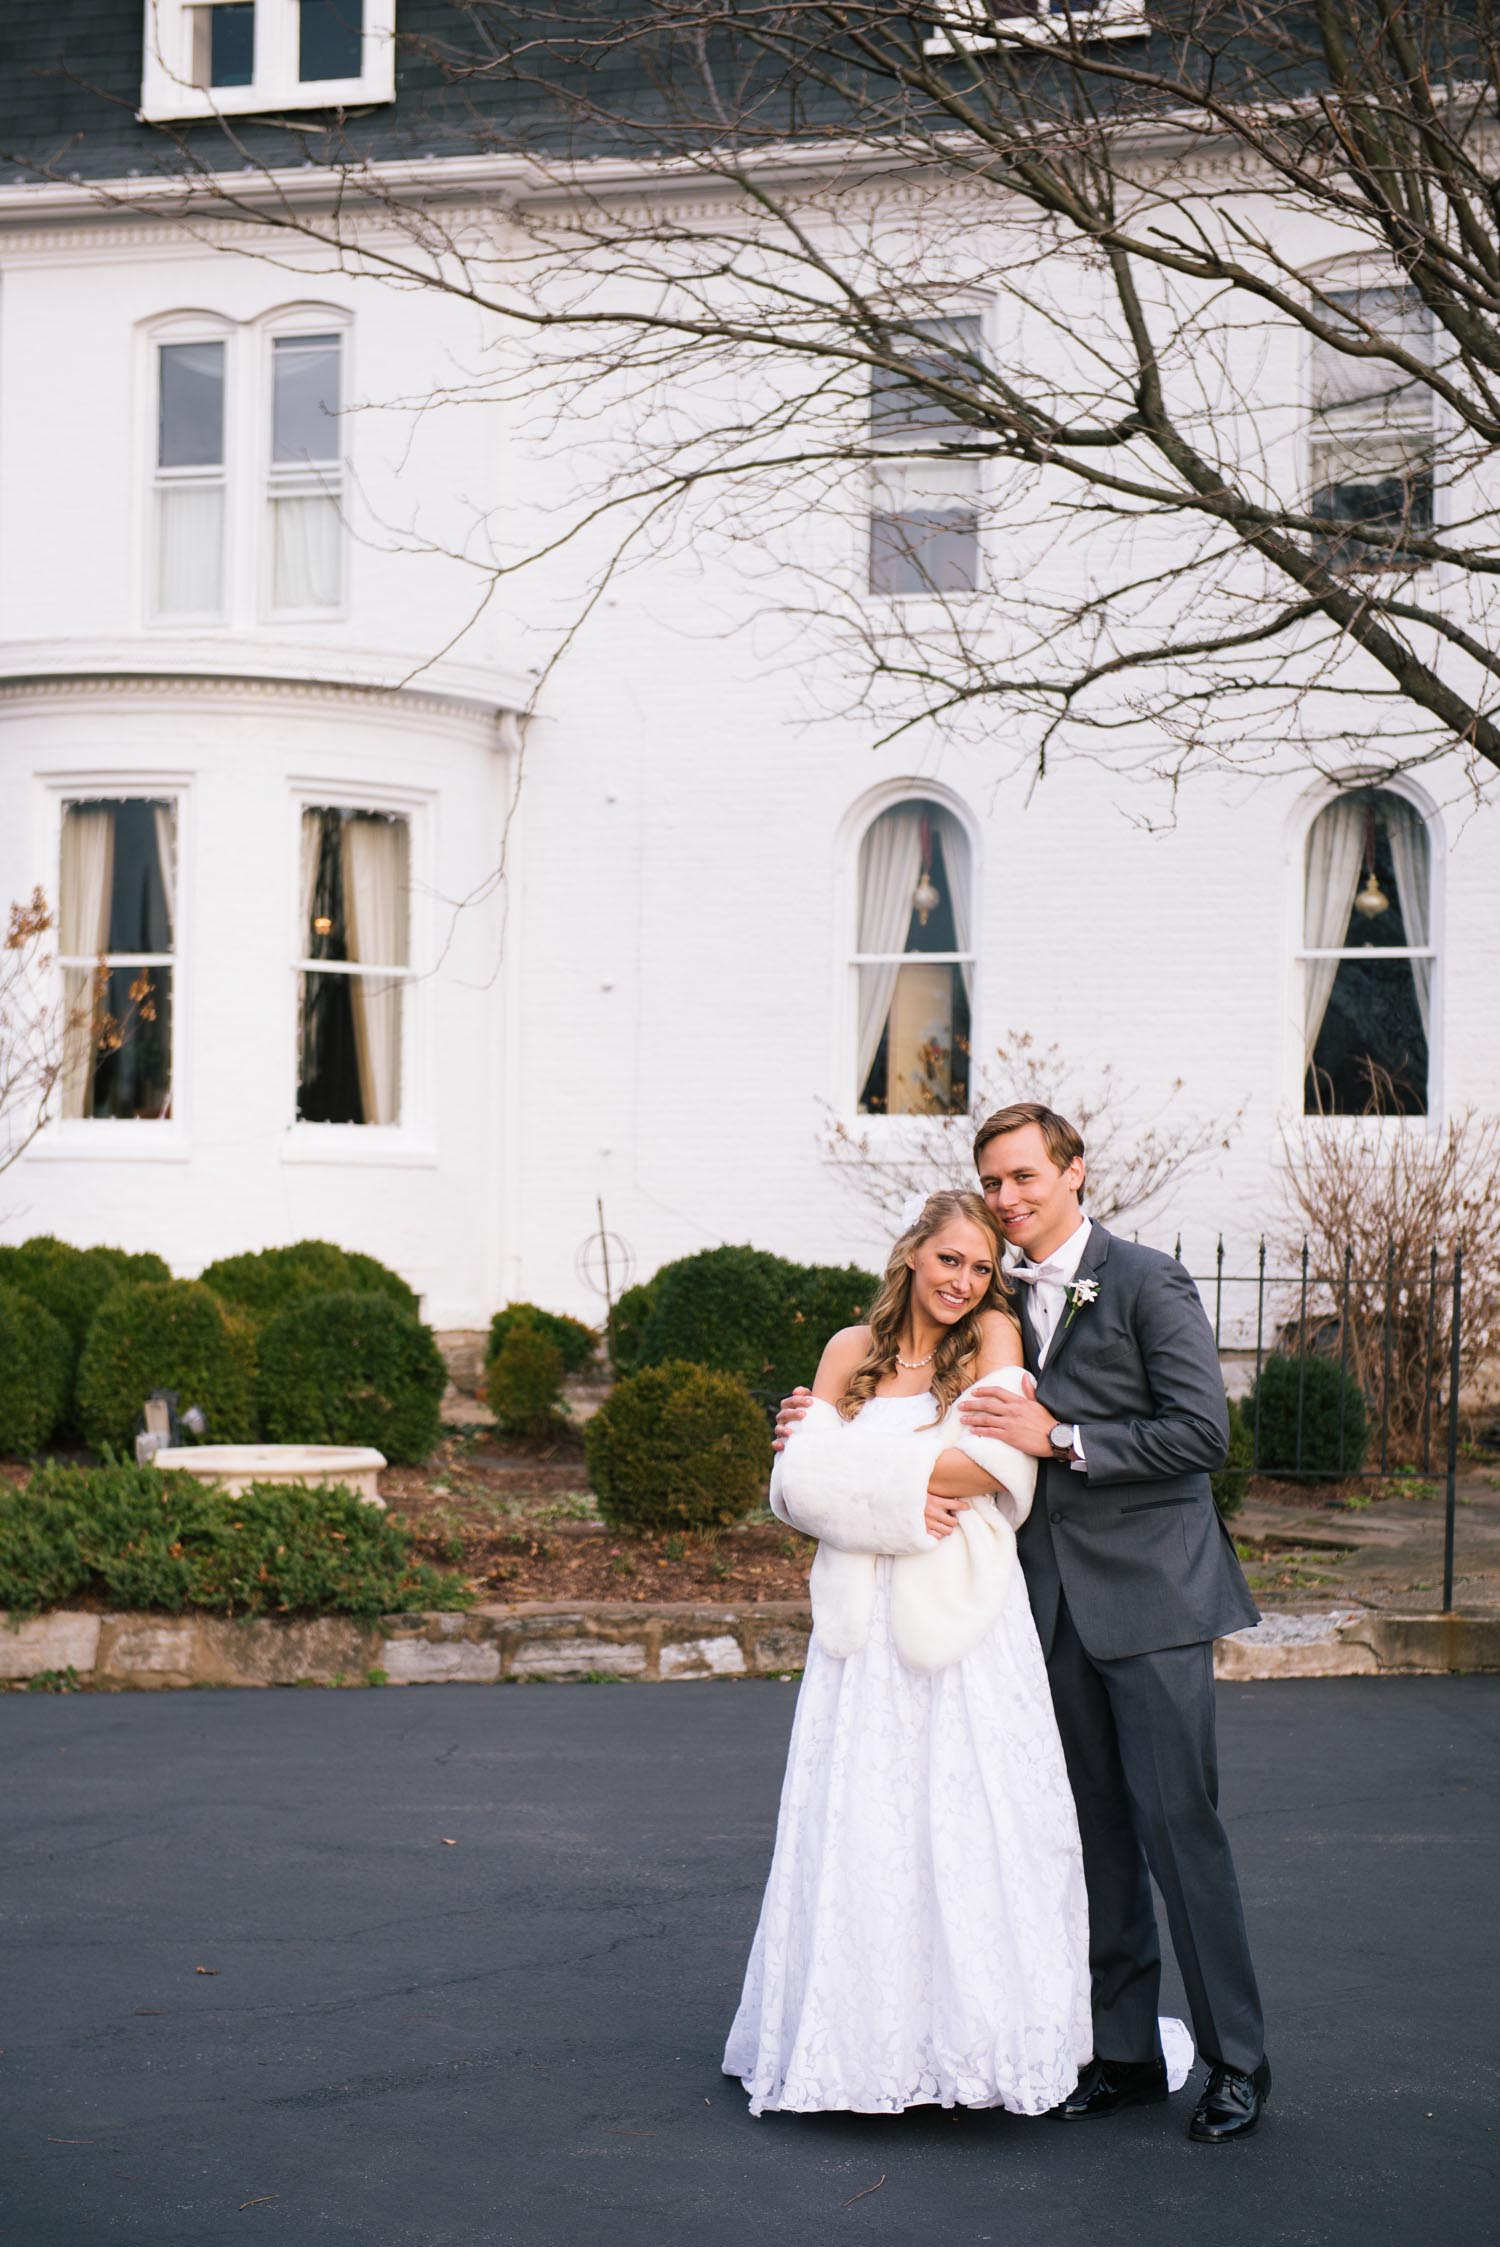 youngstrom-wedding-87.jpg